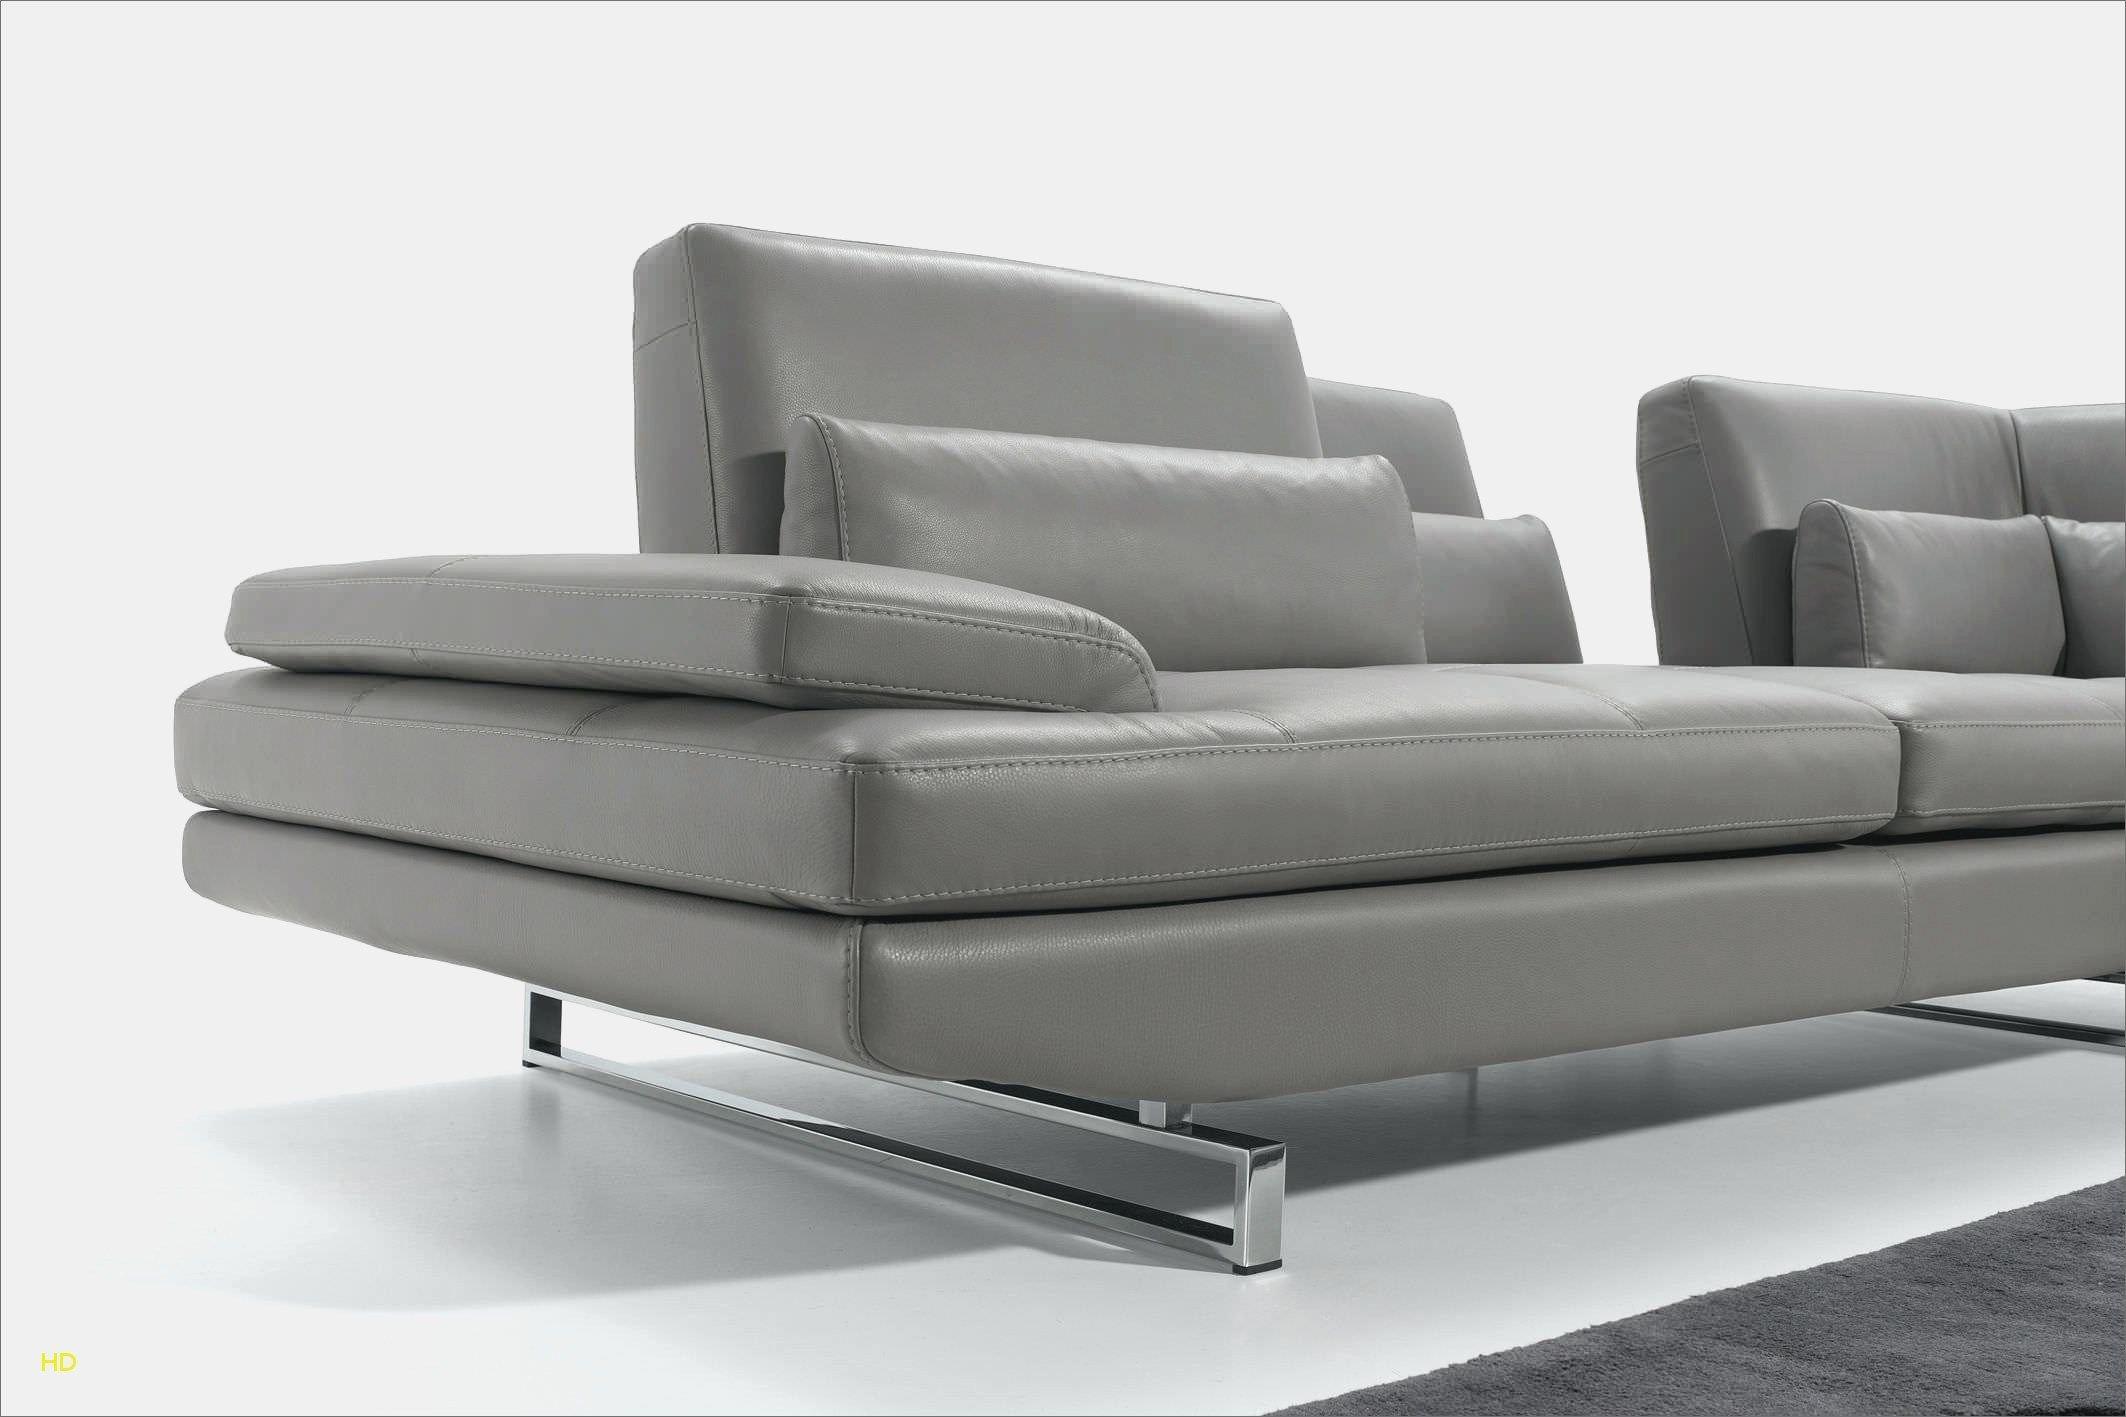 Inspirational Canape D Angle Ektorp Furniture Transforming Furniture Reupholster Furniture